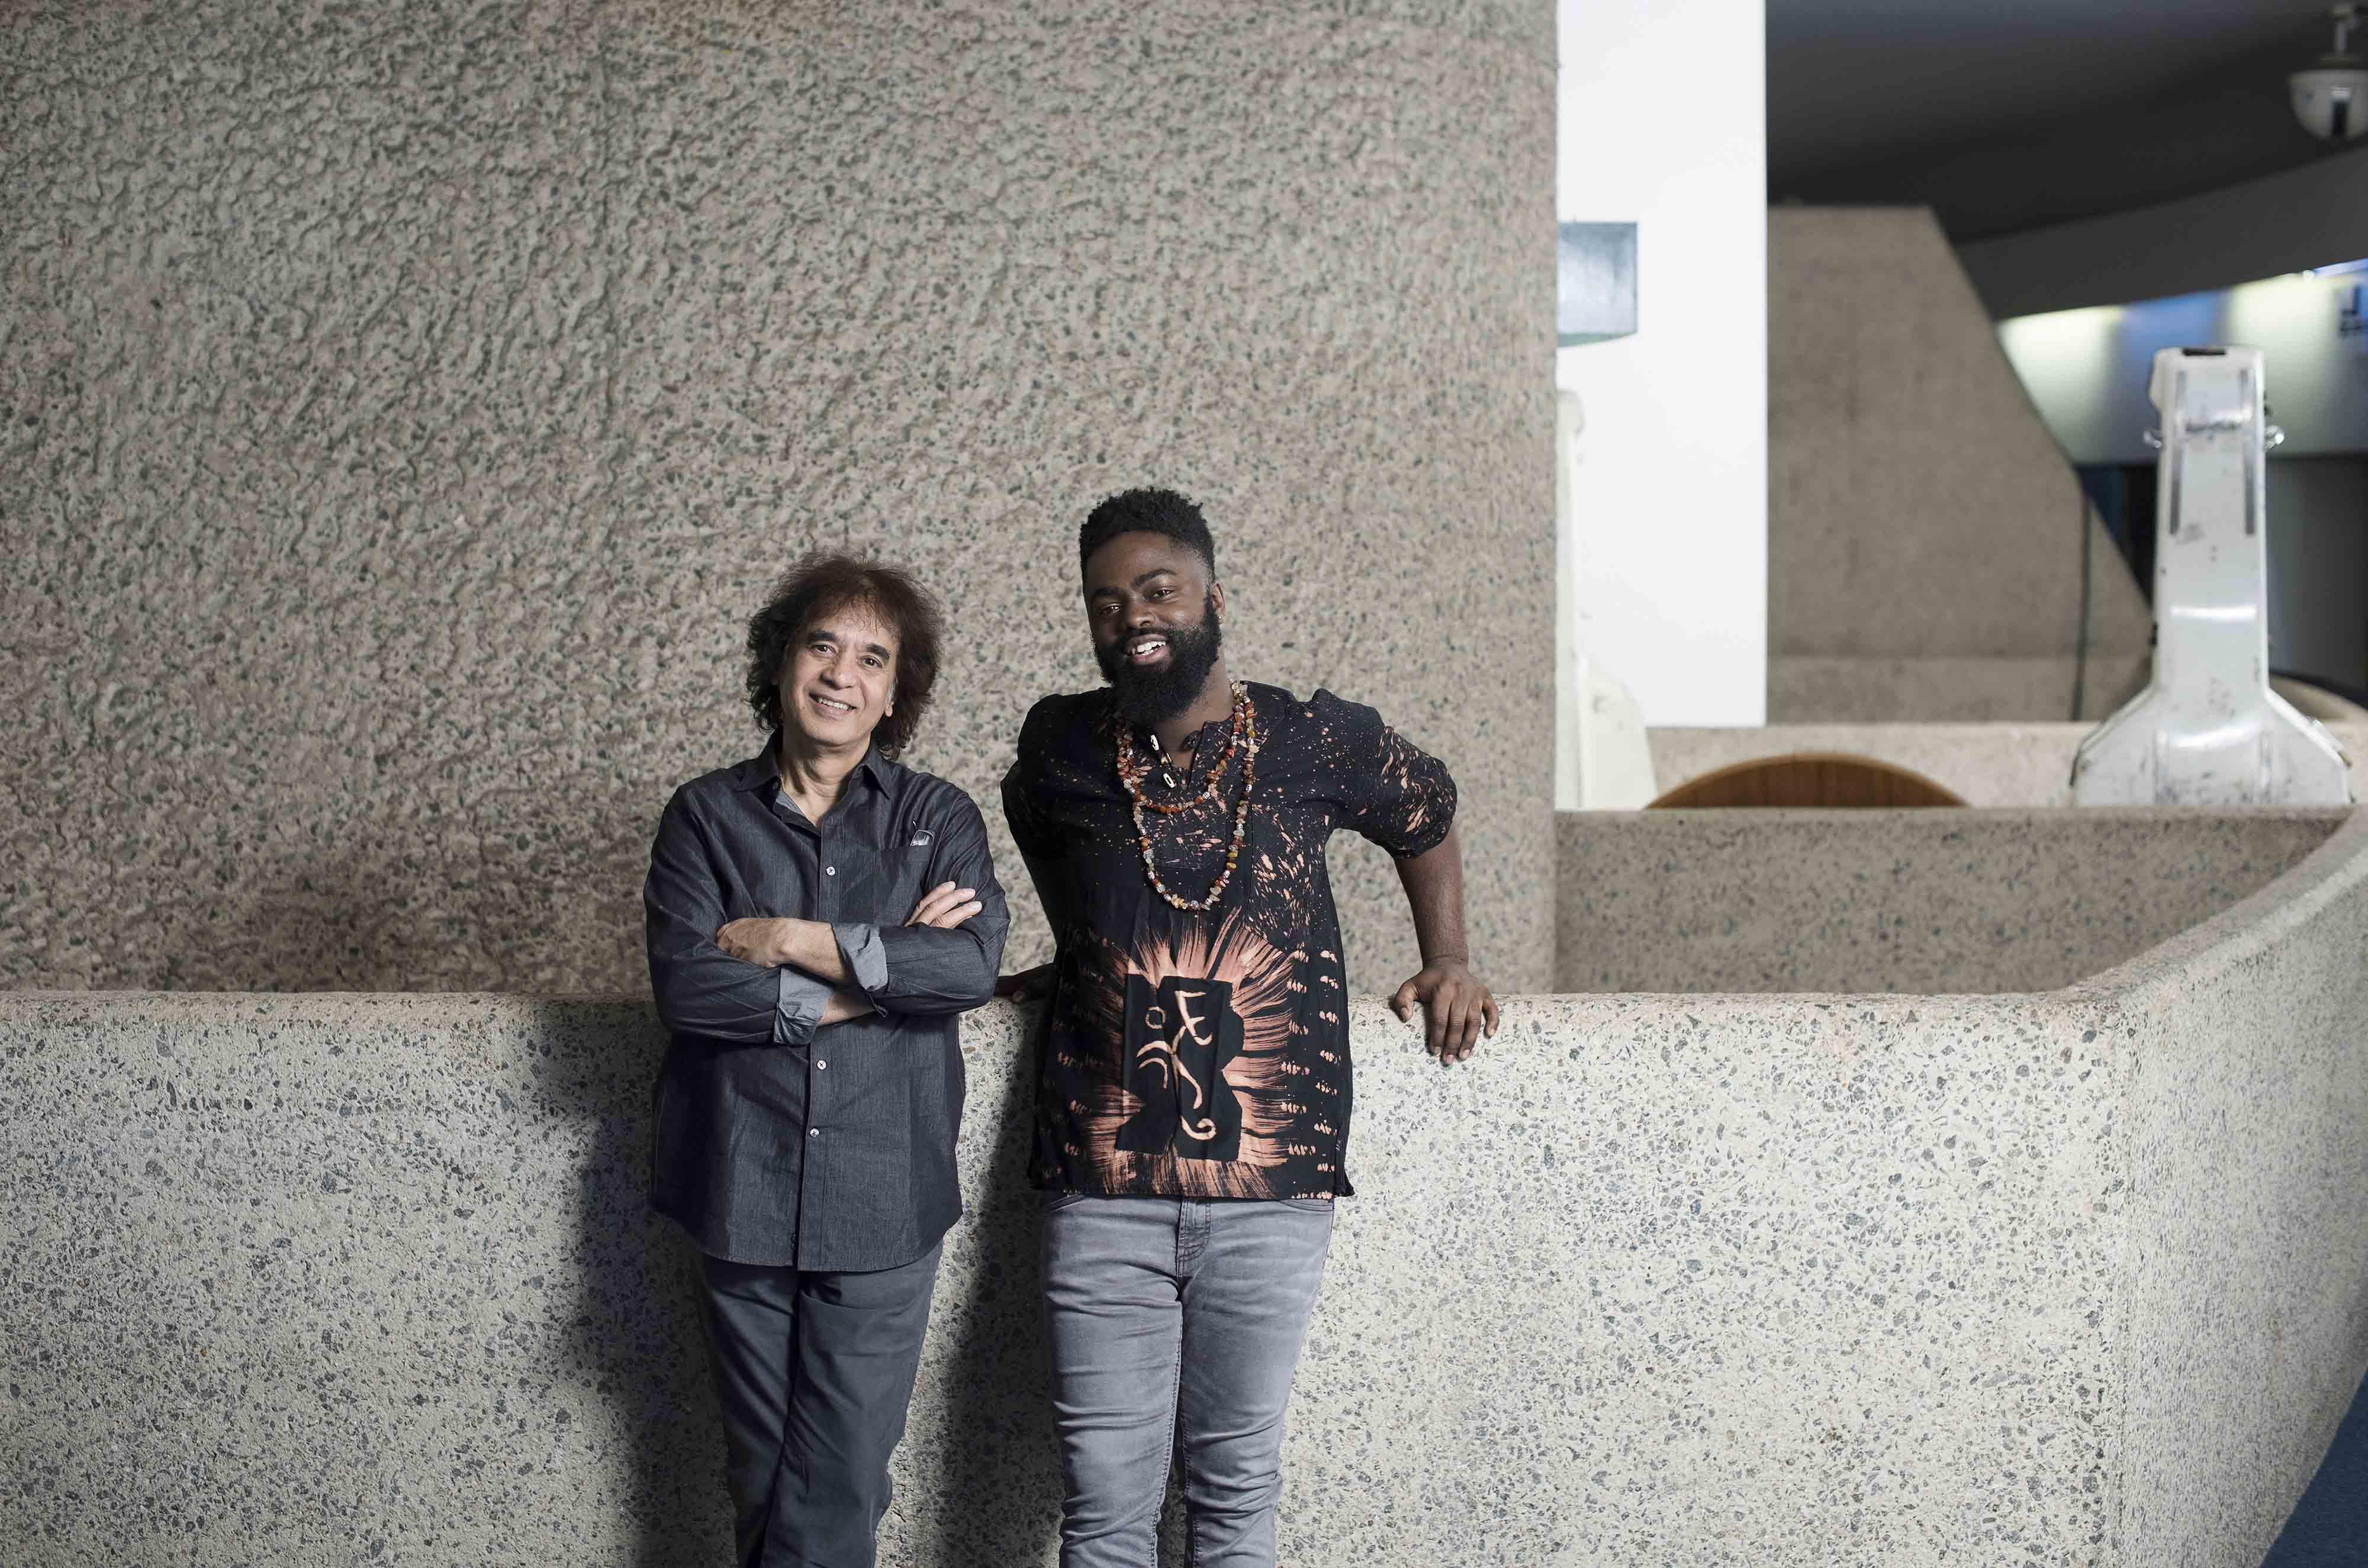 Zakir Hussain, mentor en musique et son protégé Marcus Gilmore. ©Rolex/Hugo Glendinning.